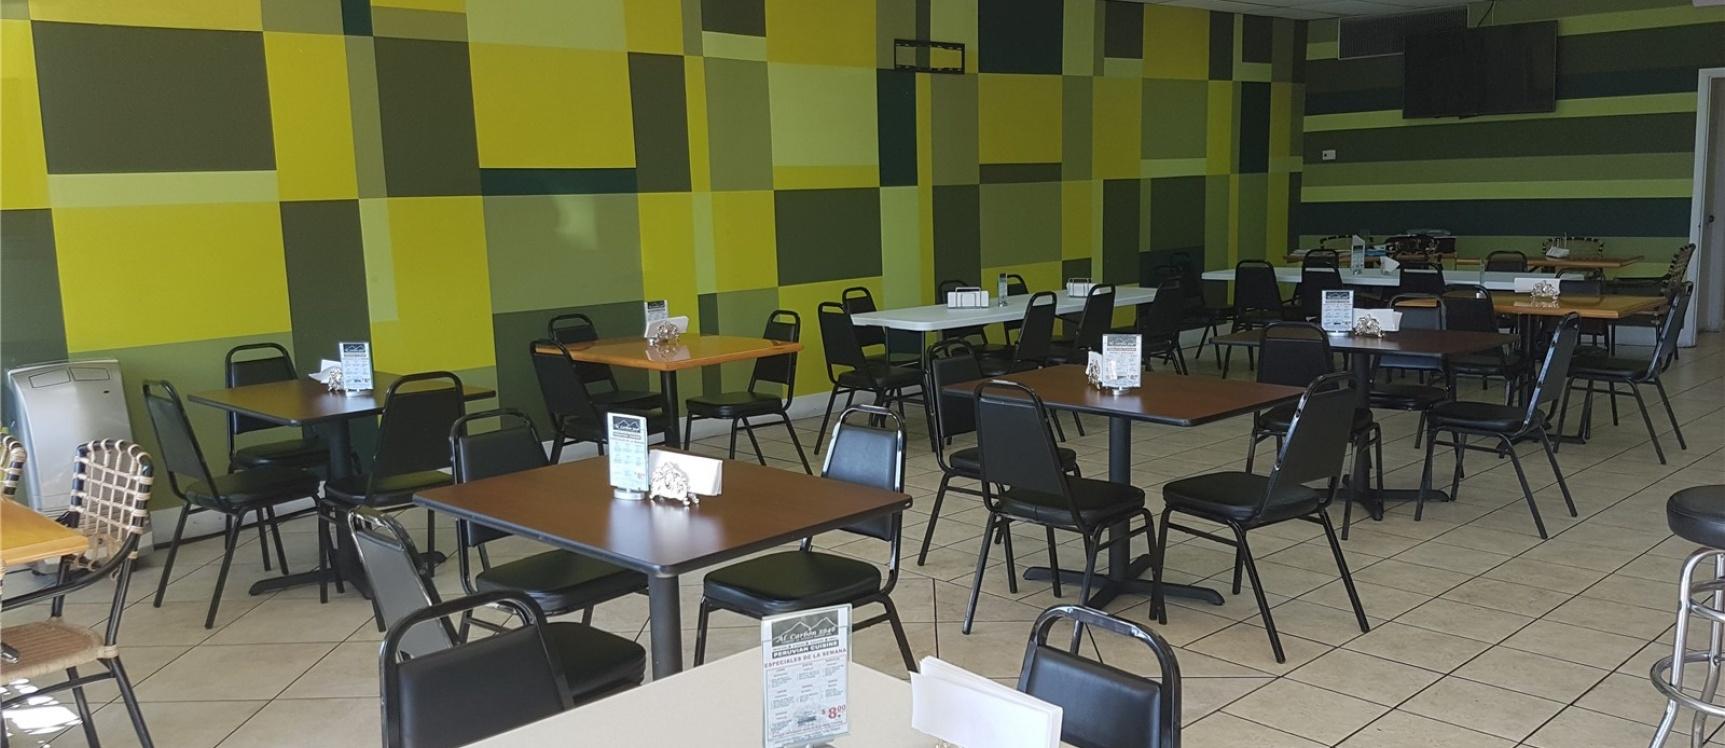 GeoBienes - Business Opportunity for Sale in MIAMI near airport - Plusvalia Guayaquil Casas de venta y alquiler Inmobiliaria Ecuador